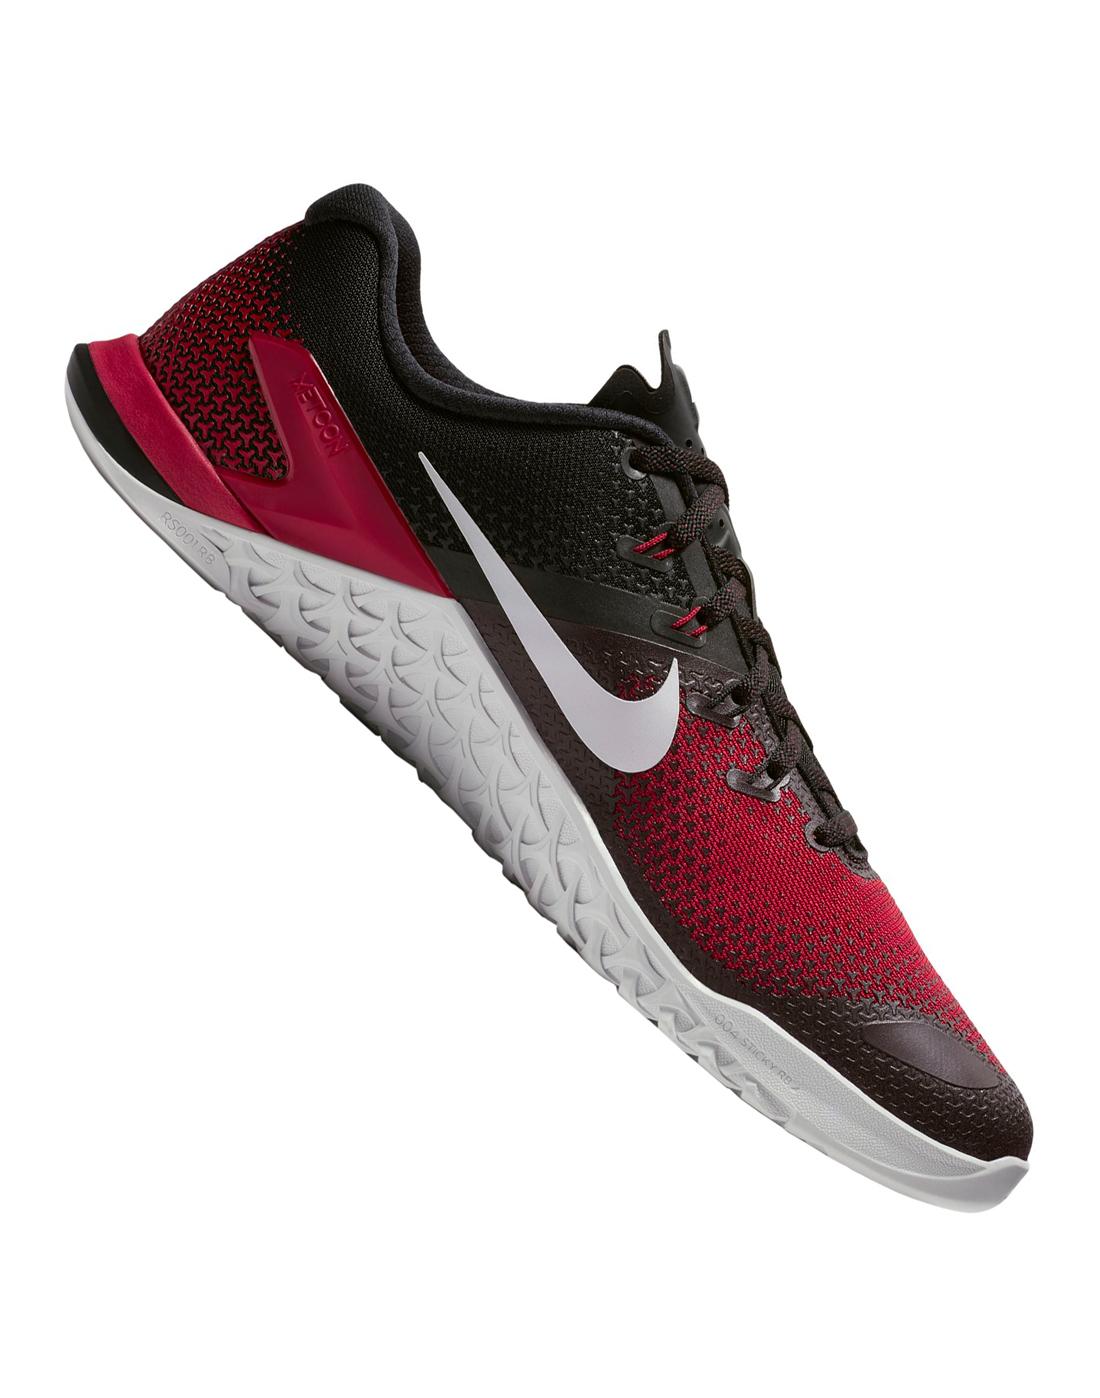 6a4d95f3d811 Men s Nike Metcon 4